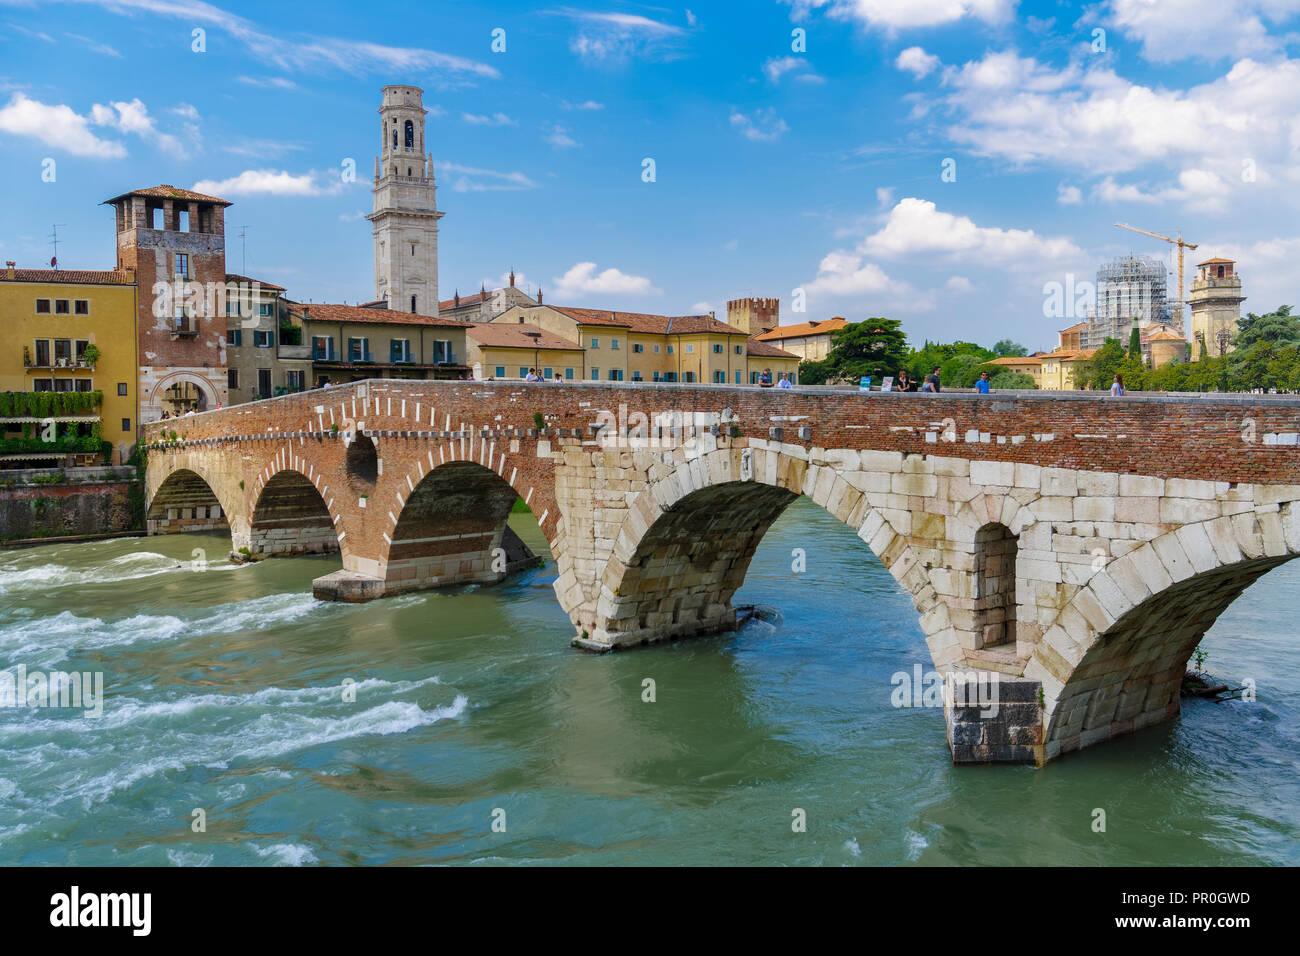 Ponte Pietra, the stone Roman arch bridge crossing River Adige, Verona, Veneto, Italy, Europe Stock Photo